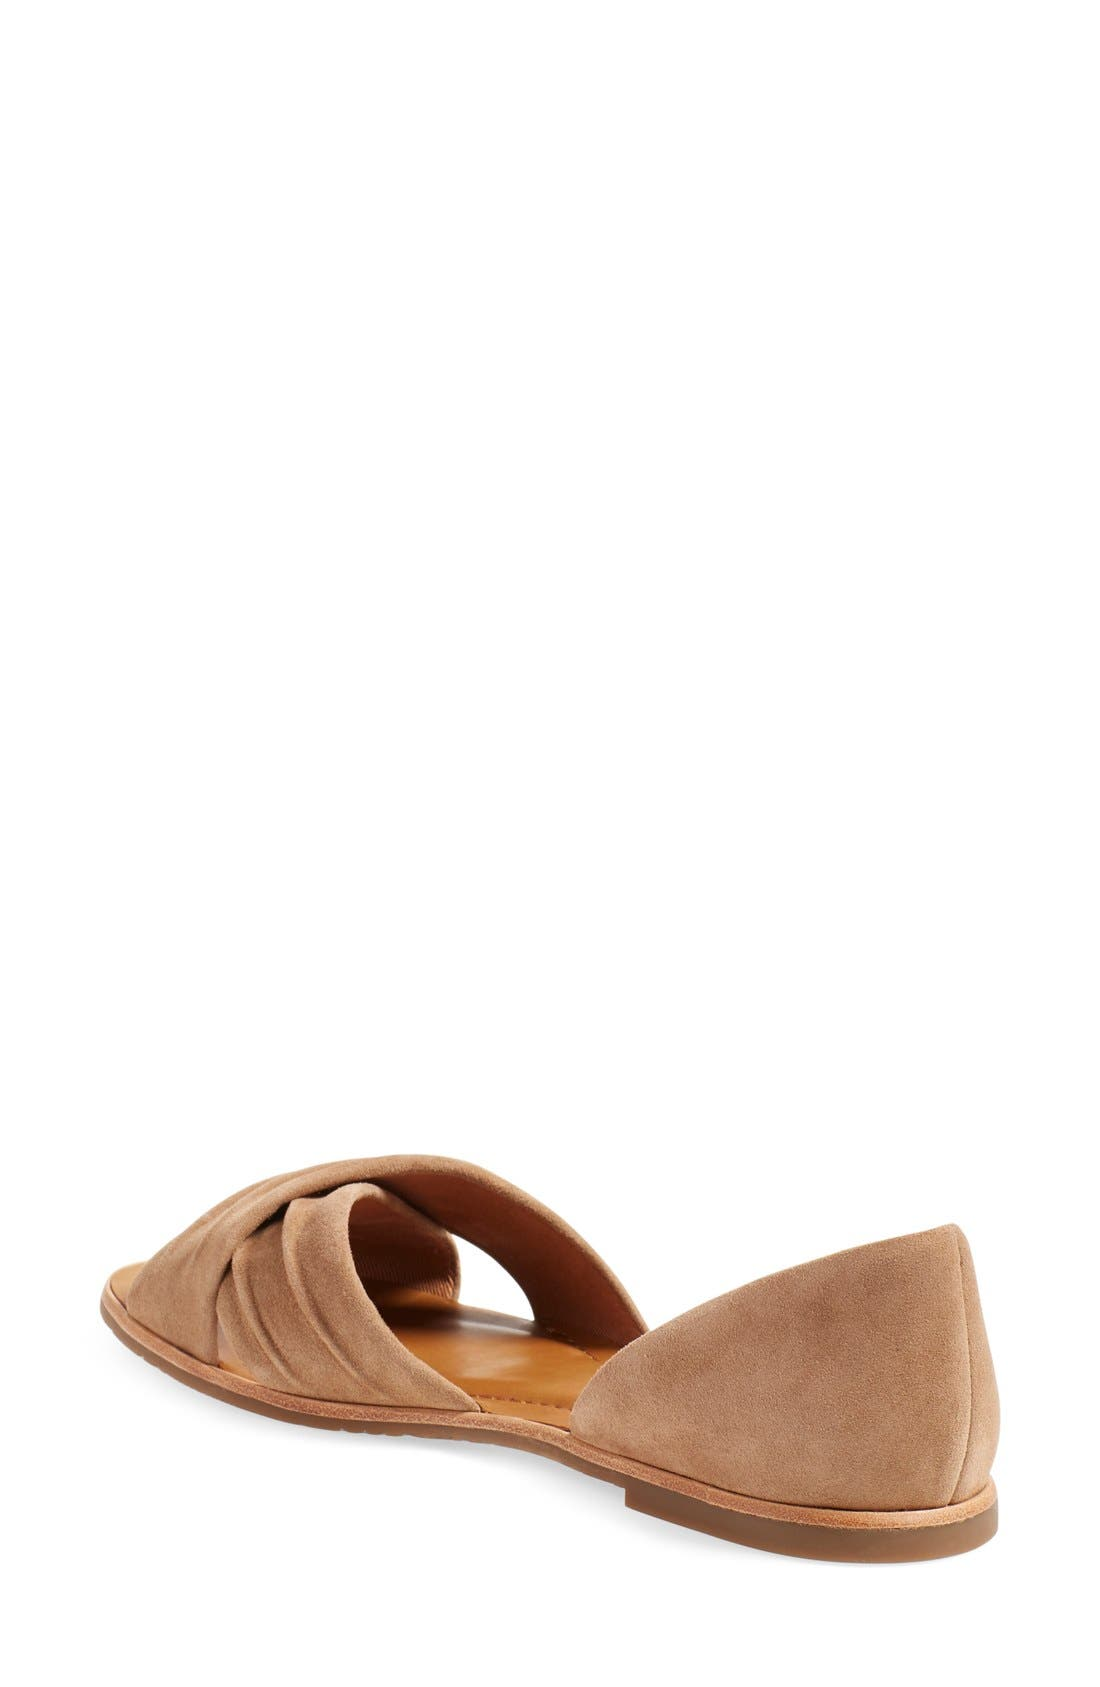 Alternate Image 2  - SARTO by Franco Sarto 'Vala' Flat Sandal (Women)